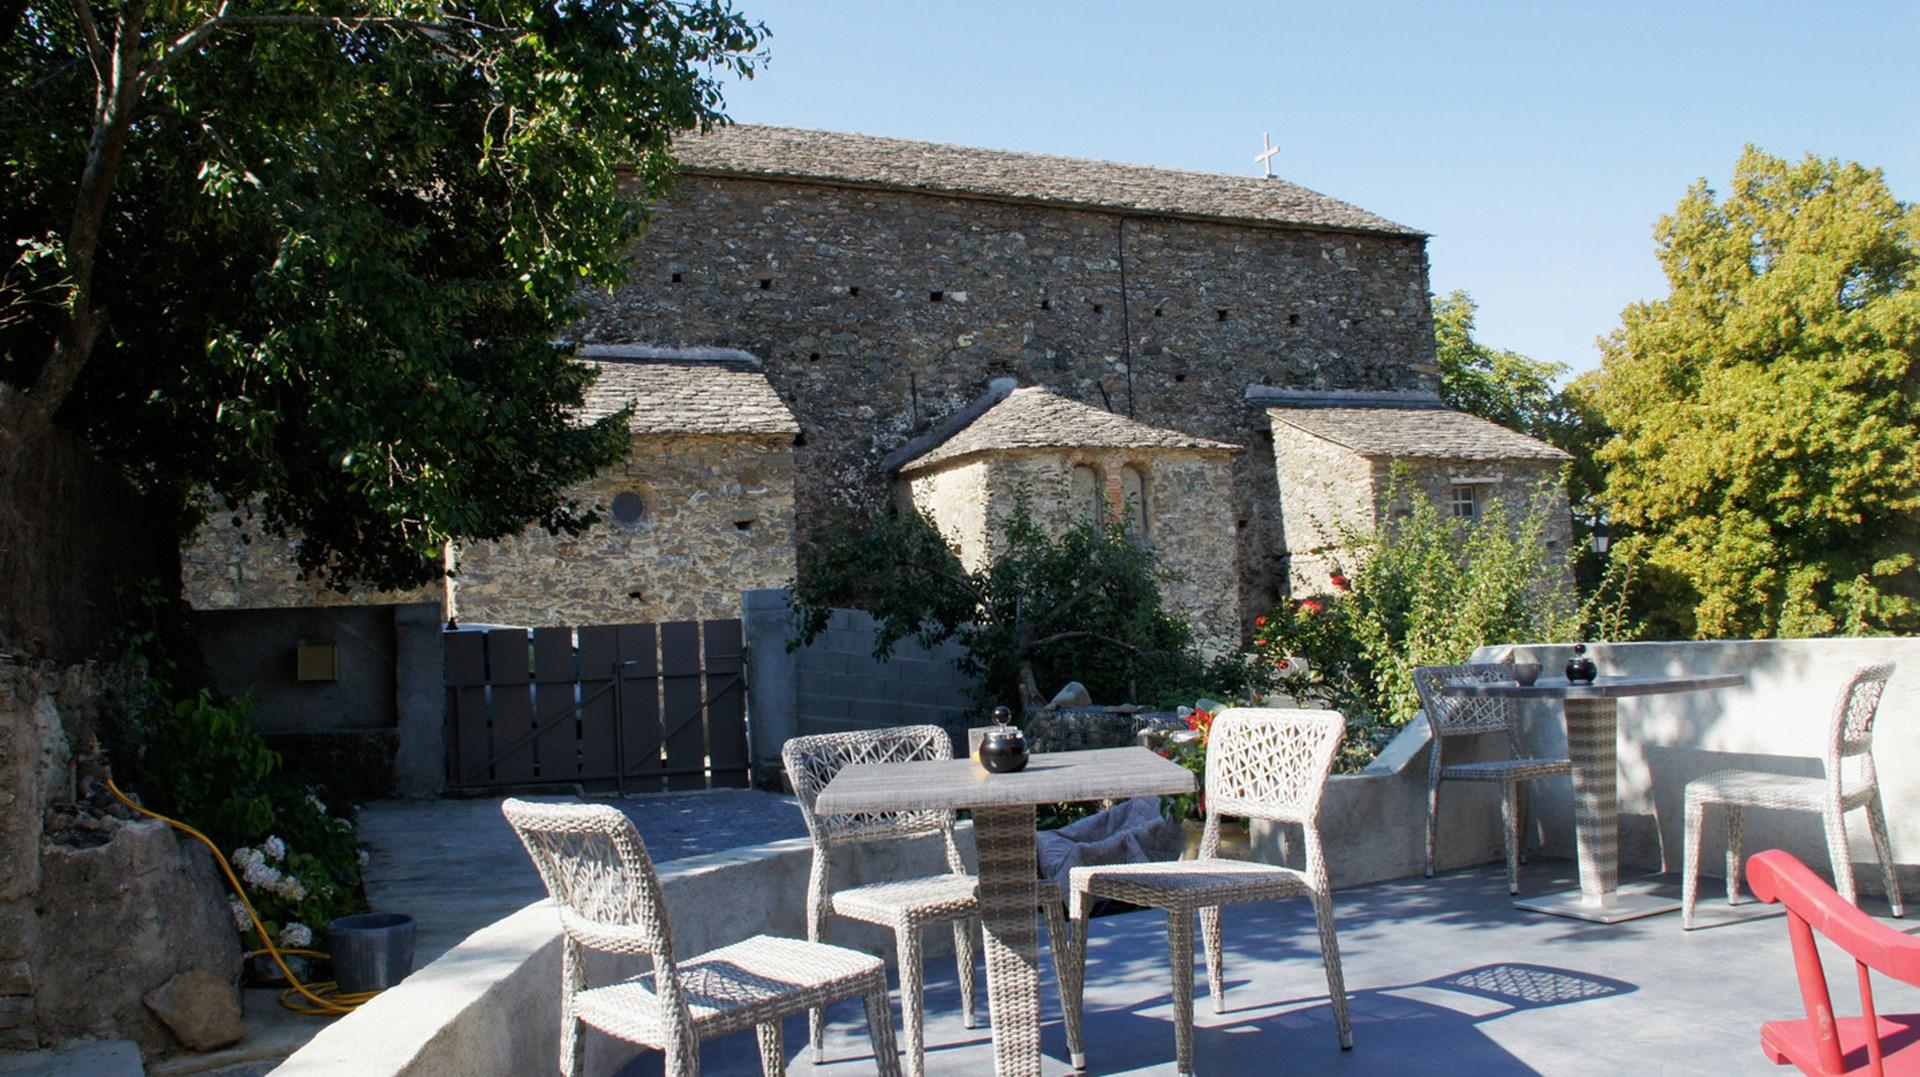 Chambres-d-hotes-bed-and-breakfast-corte-haute-corse-jardin-terrasse-dejeuner